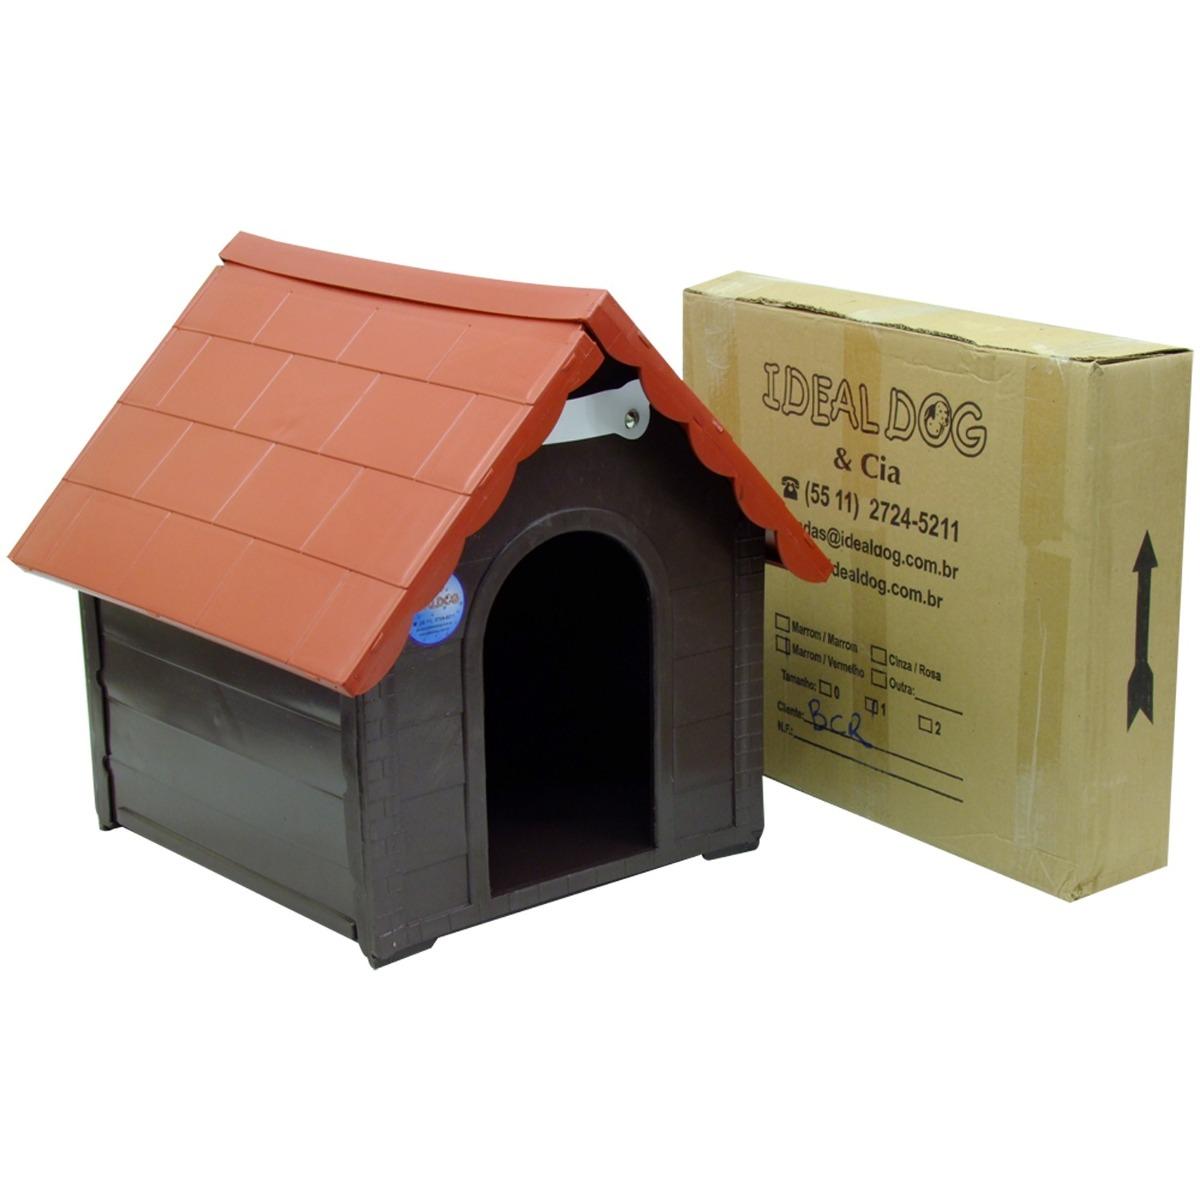 Casa Para Cães Plástica Desmontável P 36 X 28 X 35  - Casafaz